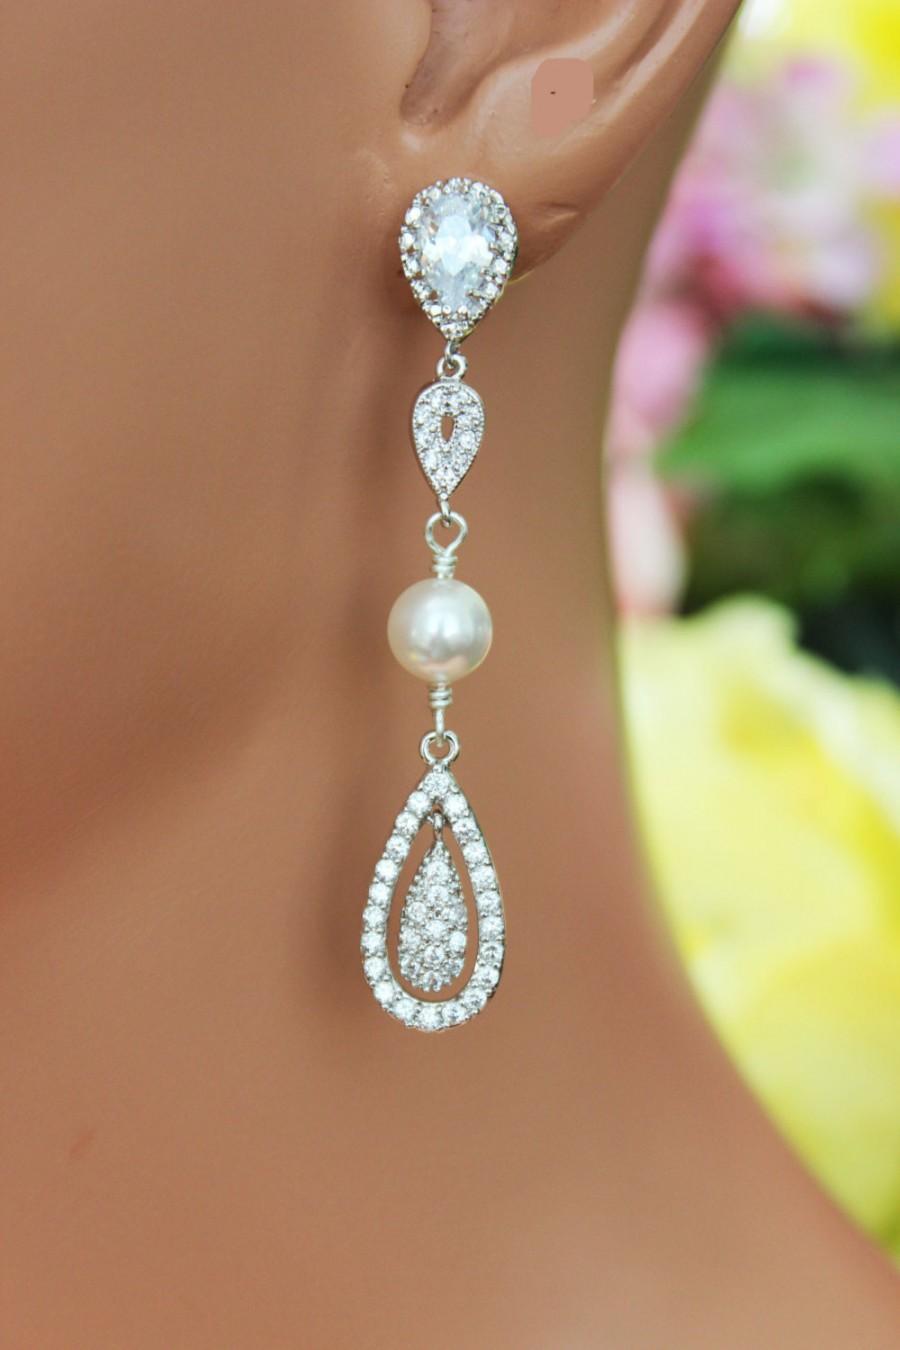 زفاف - Crystal Chandelier Wedding Earrings, Cubic Zirconia Long Bridal Earrings, Bridesmaids Earrings, Bridal Accessories, Crystal Drop Earrings